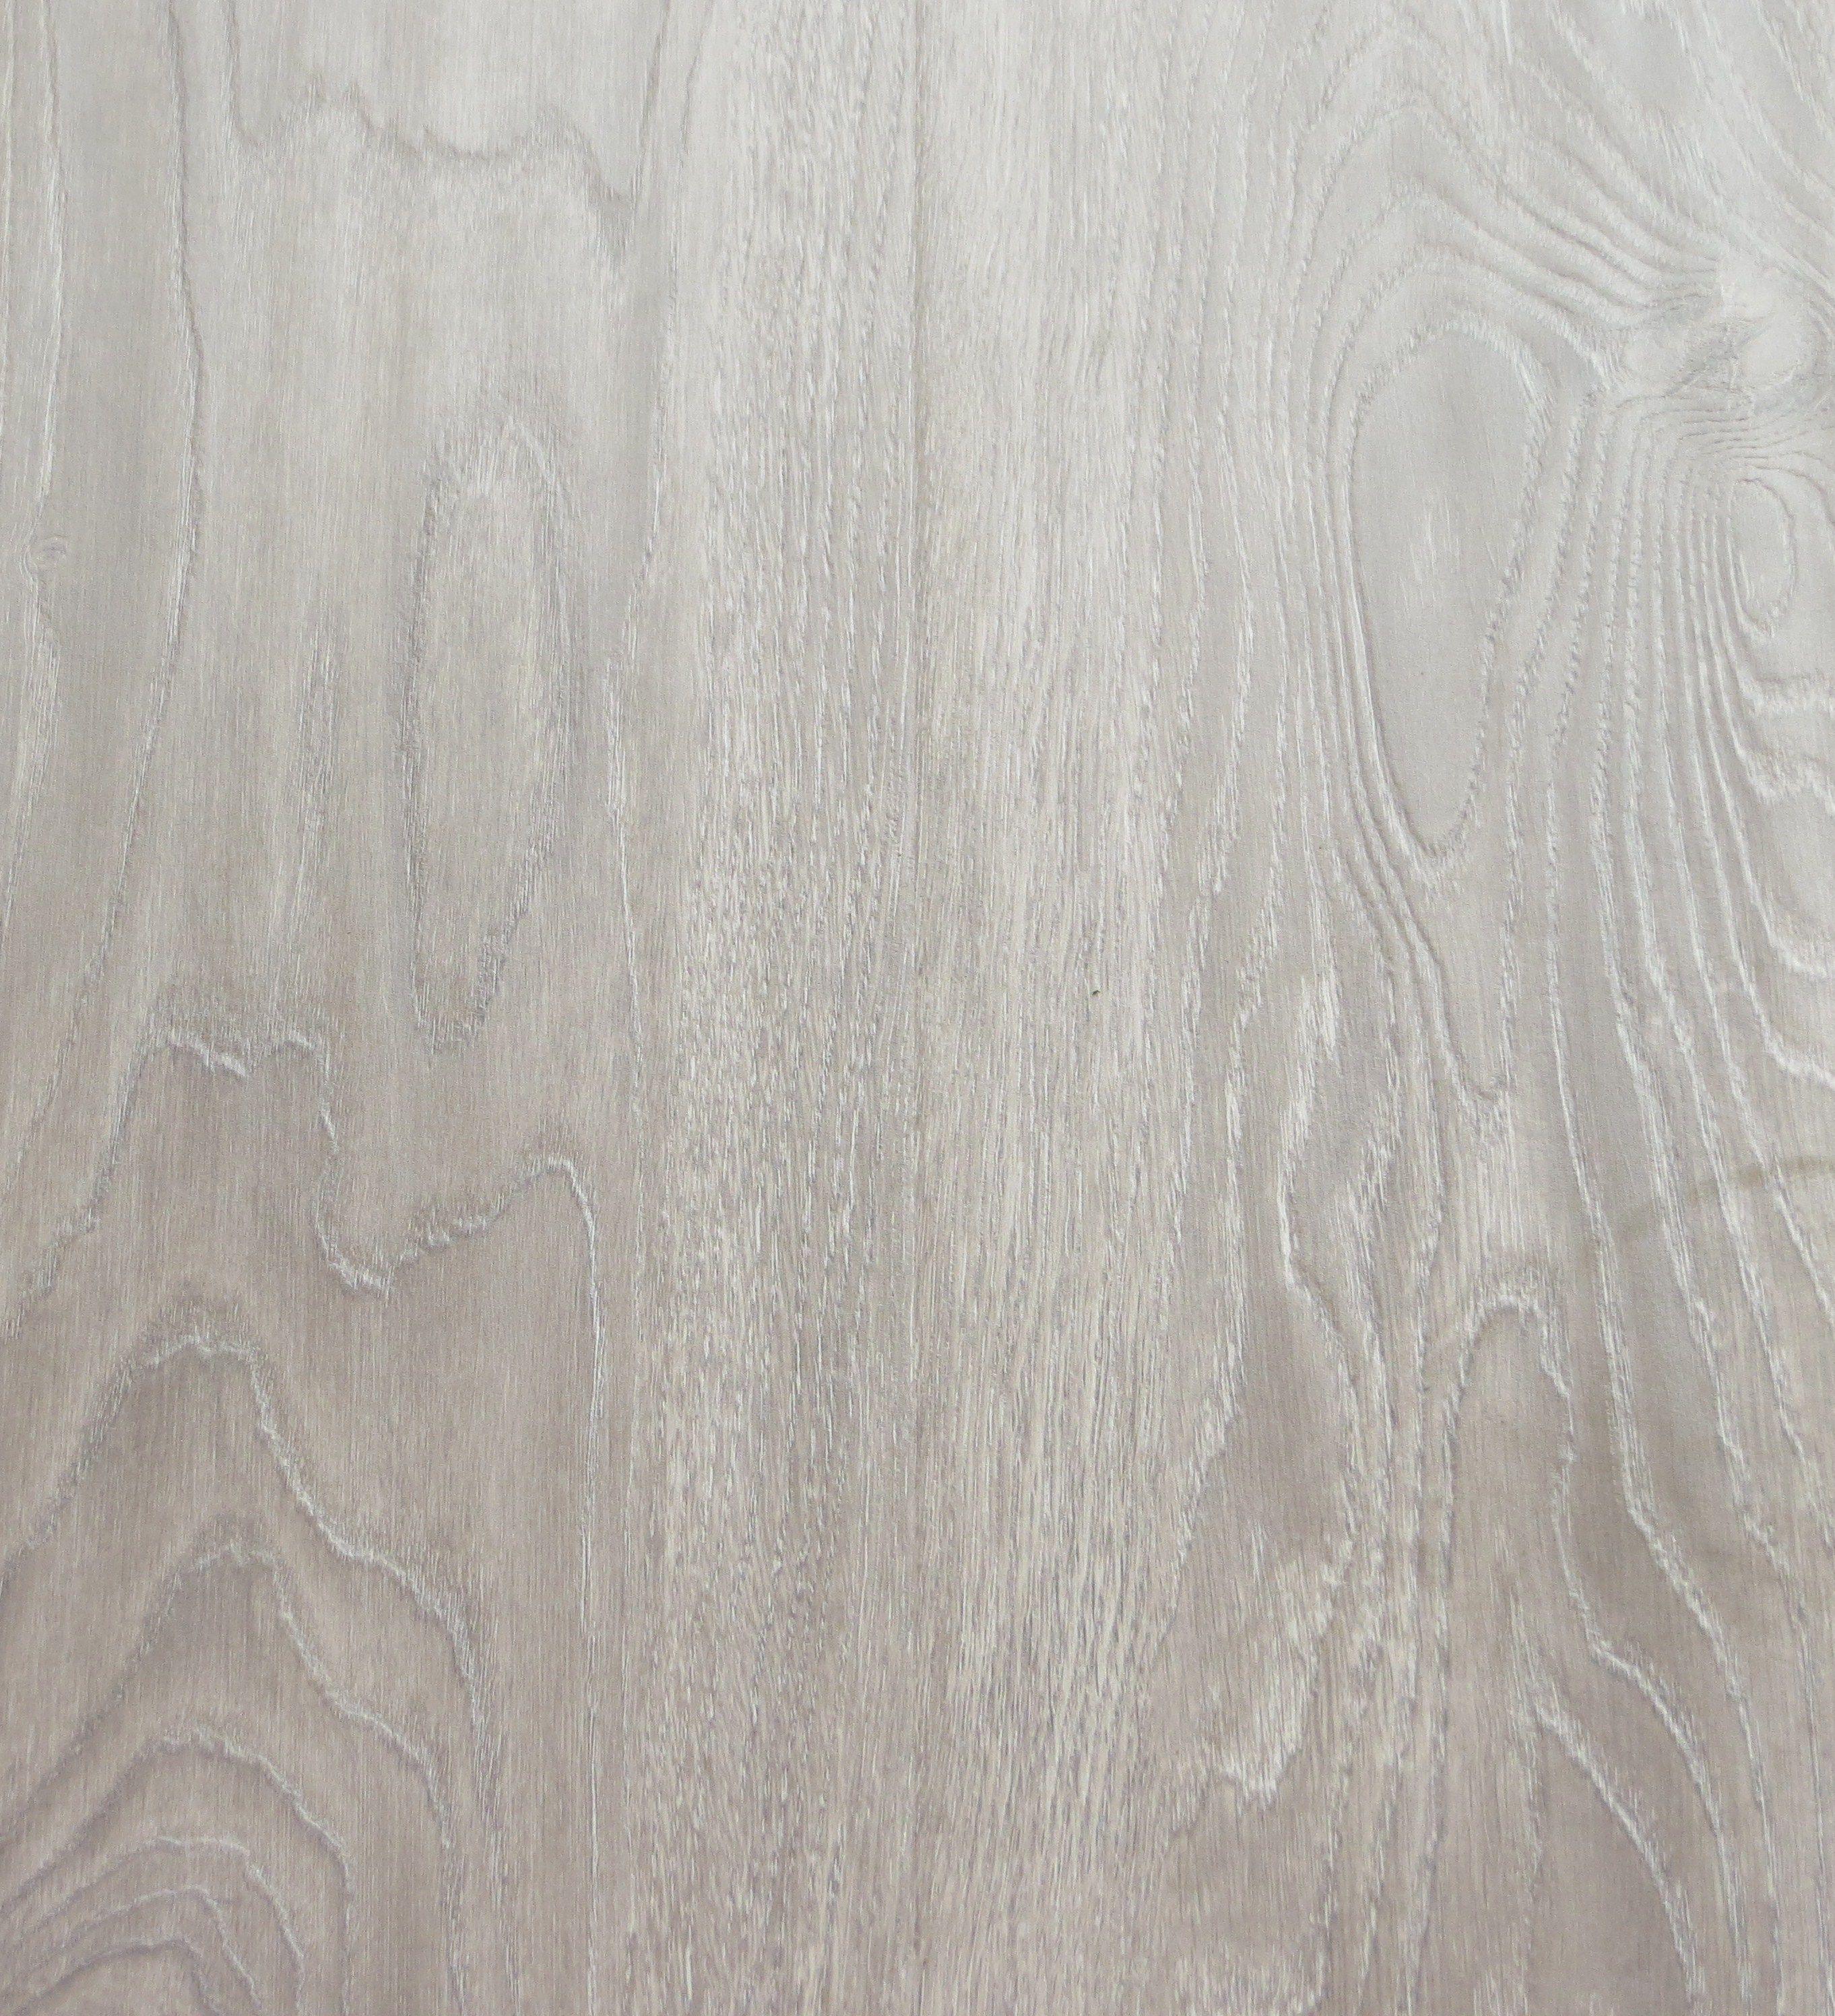 White Wash Wood Floors Grey Flooring, Free Laminate Flooring Samples